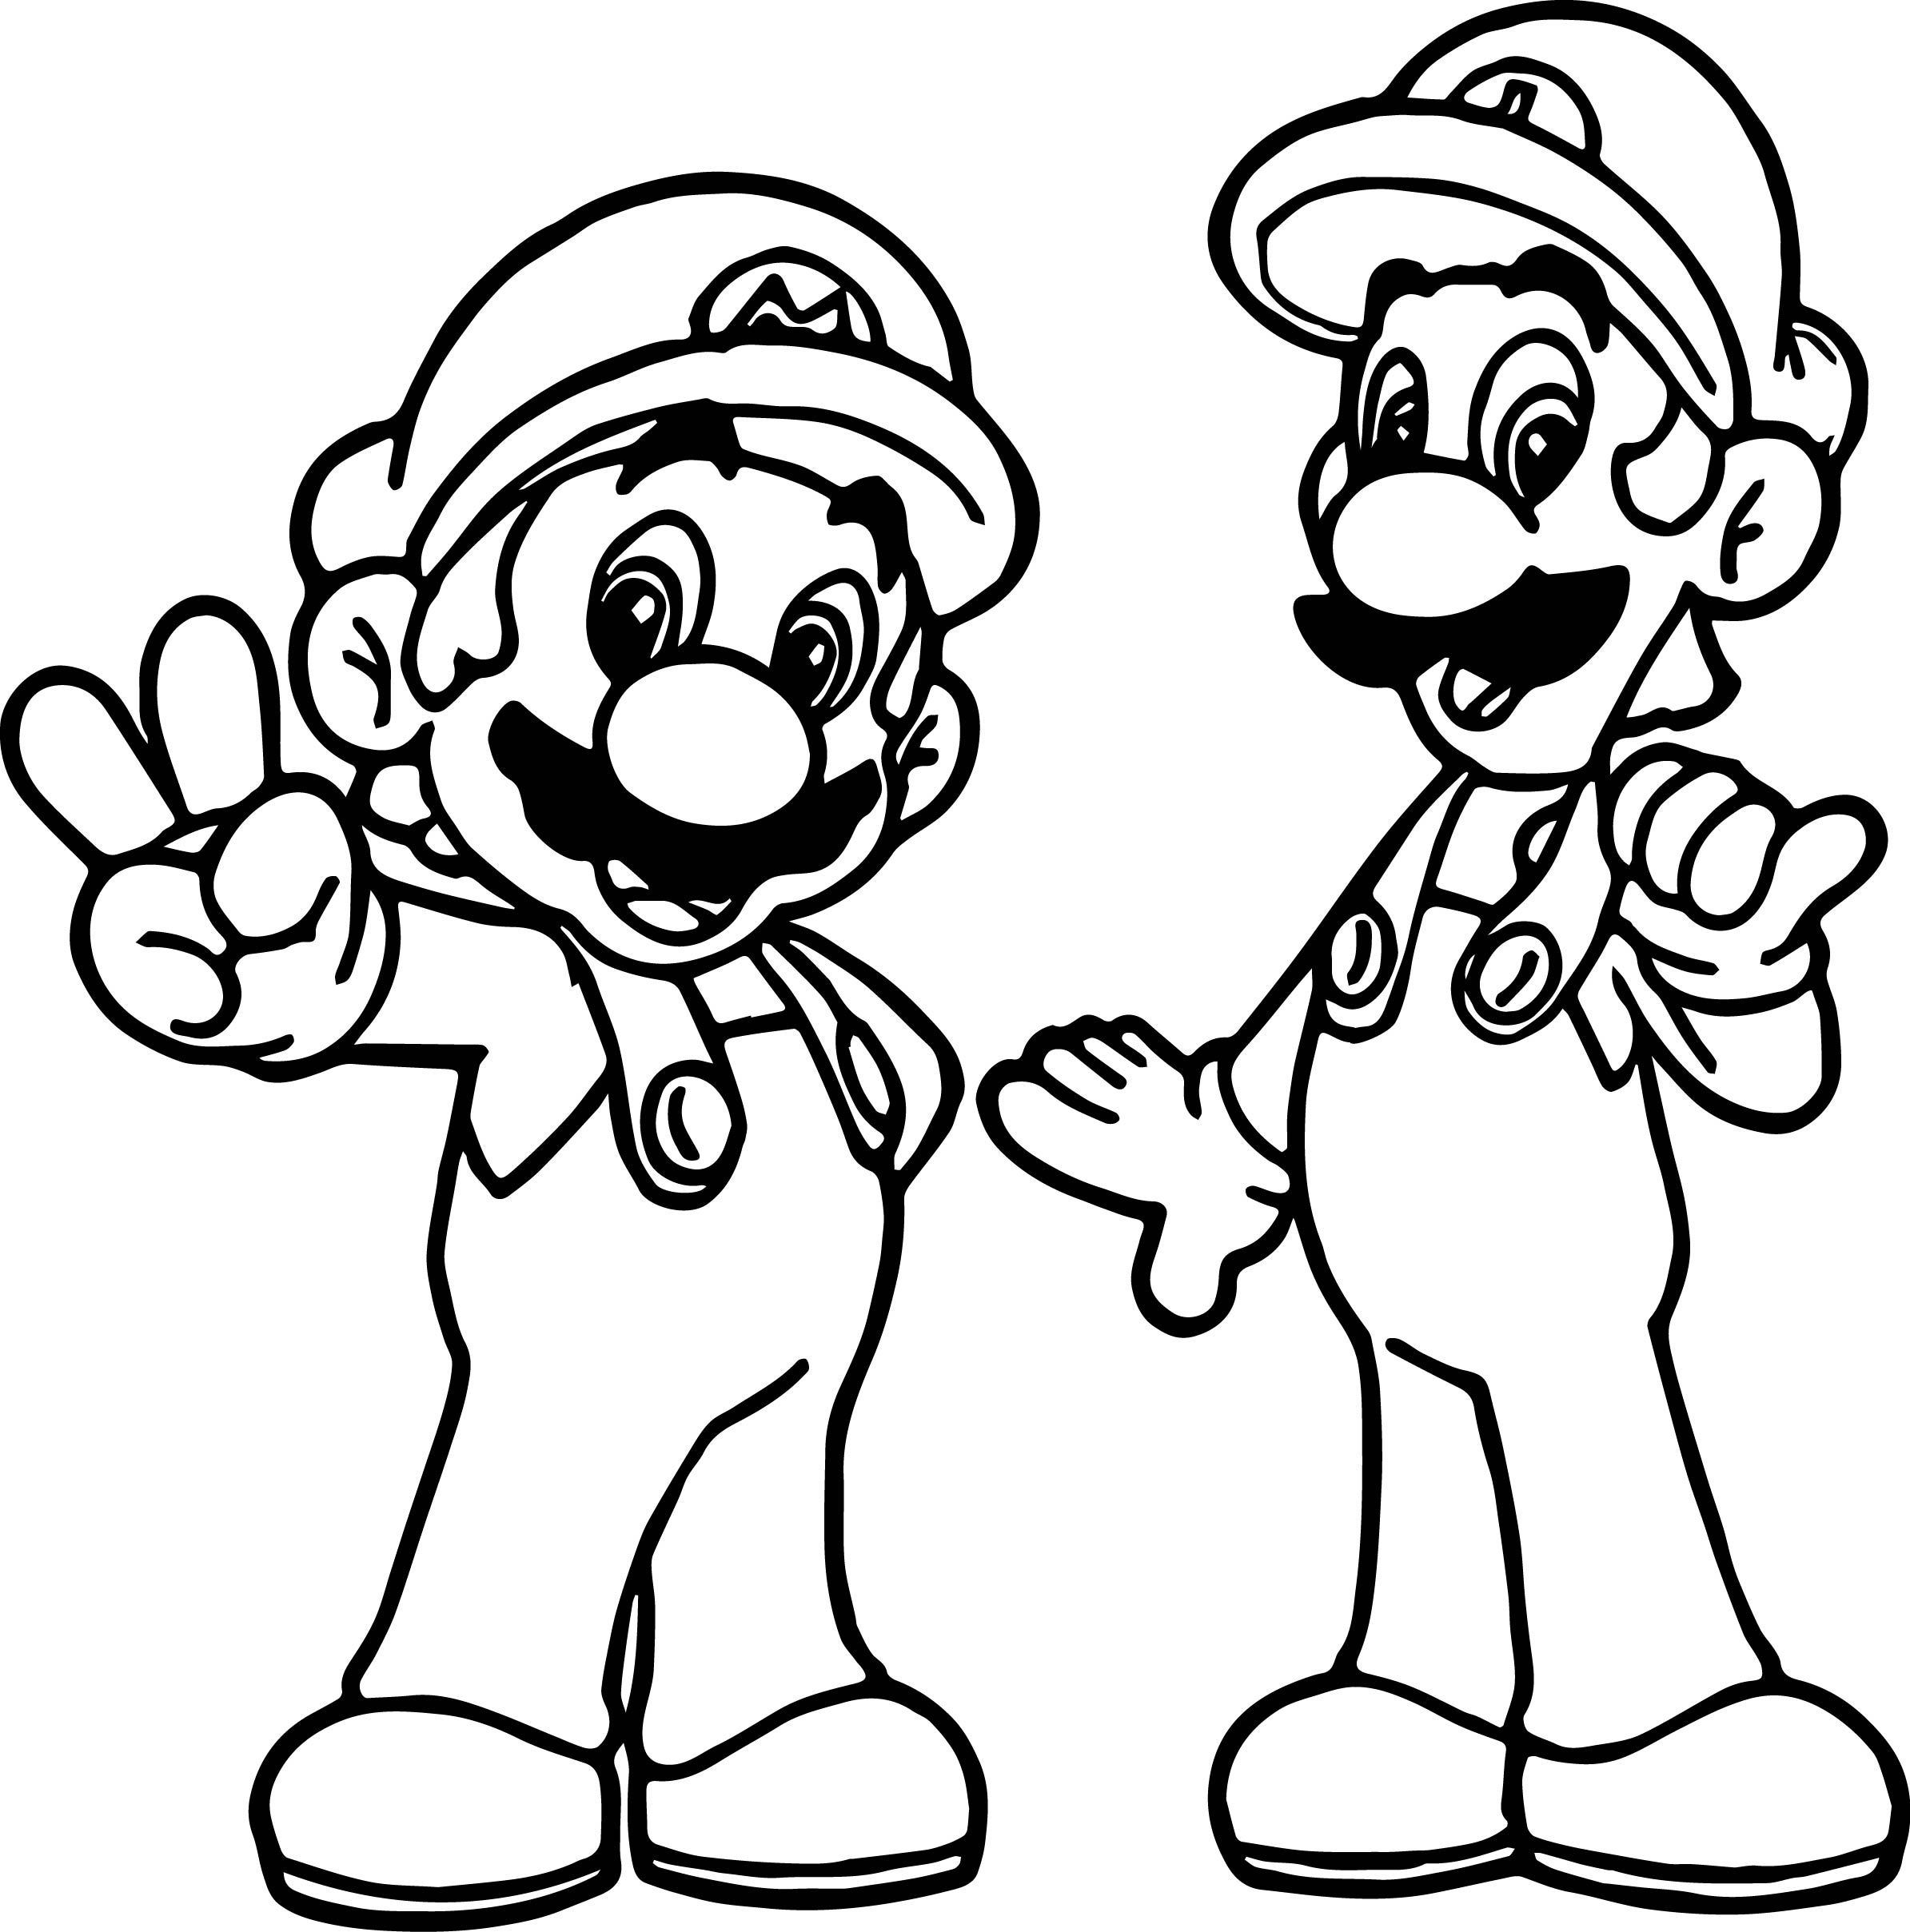 Super Mario And Luigi All Right Coloring Page   Mario ...